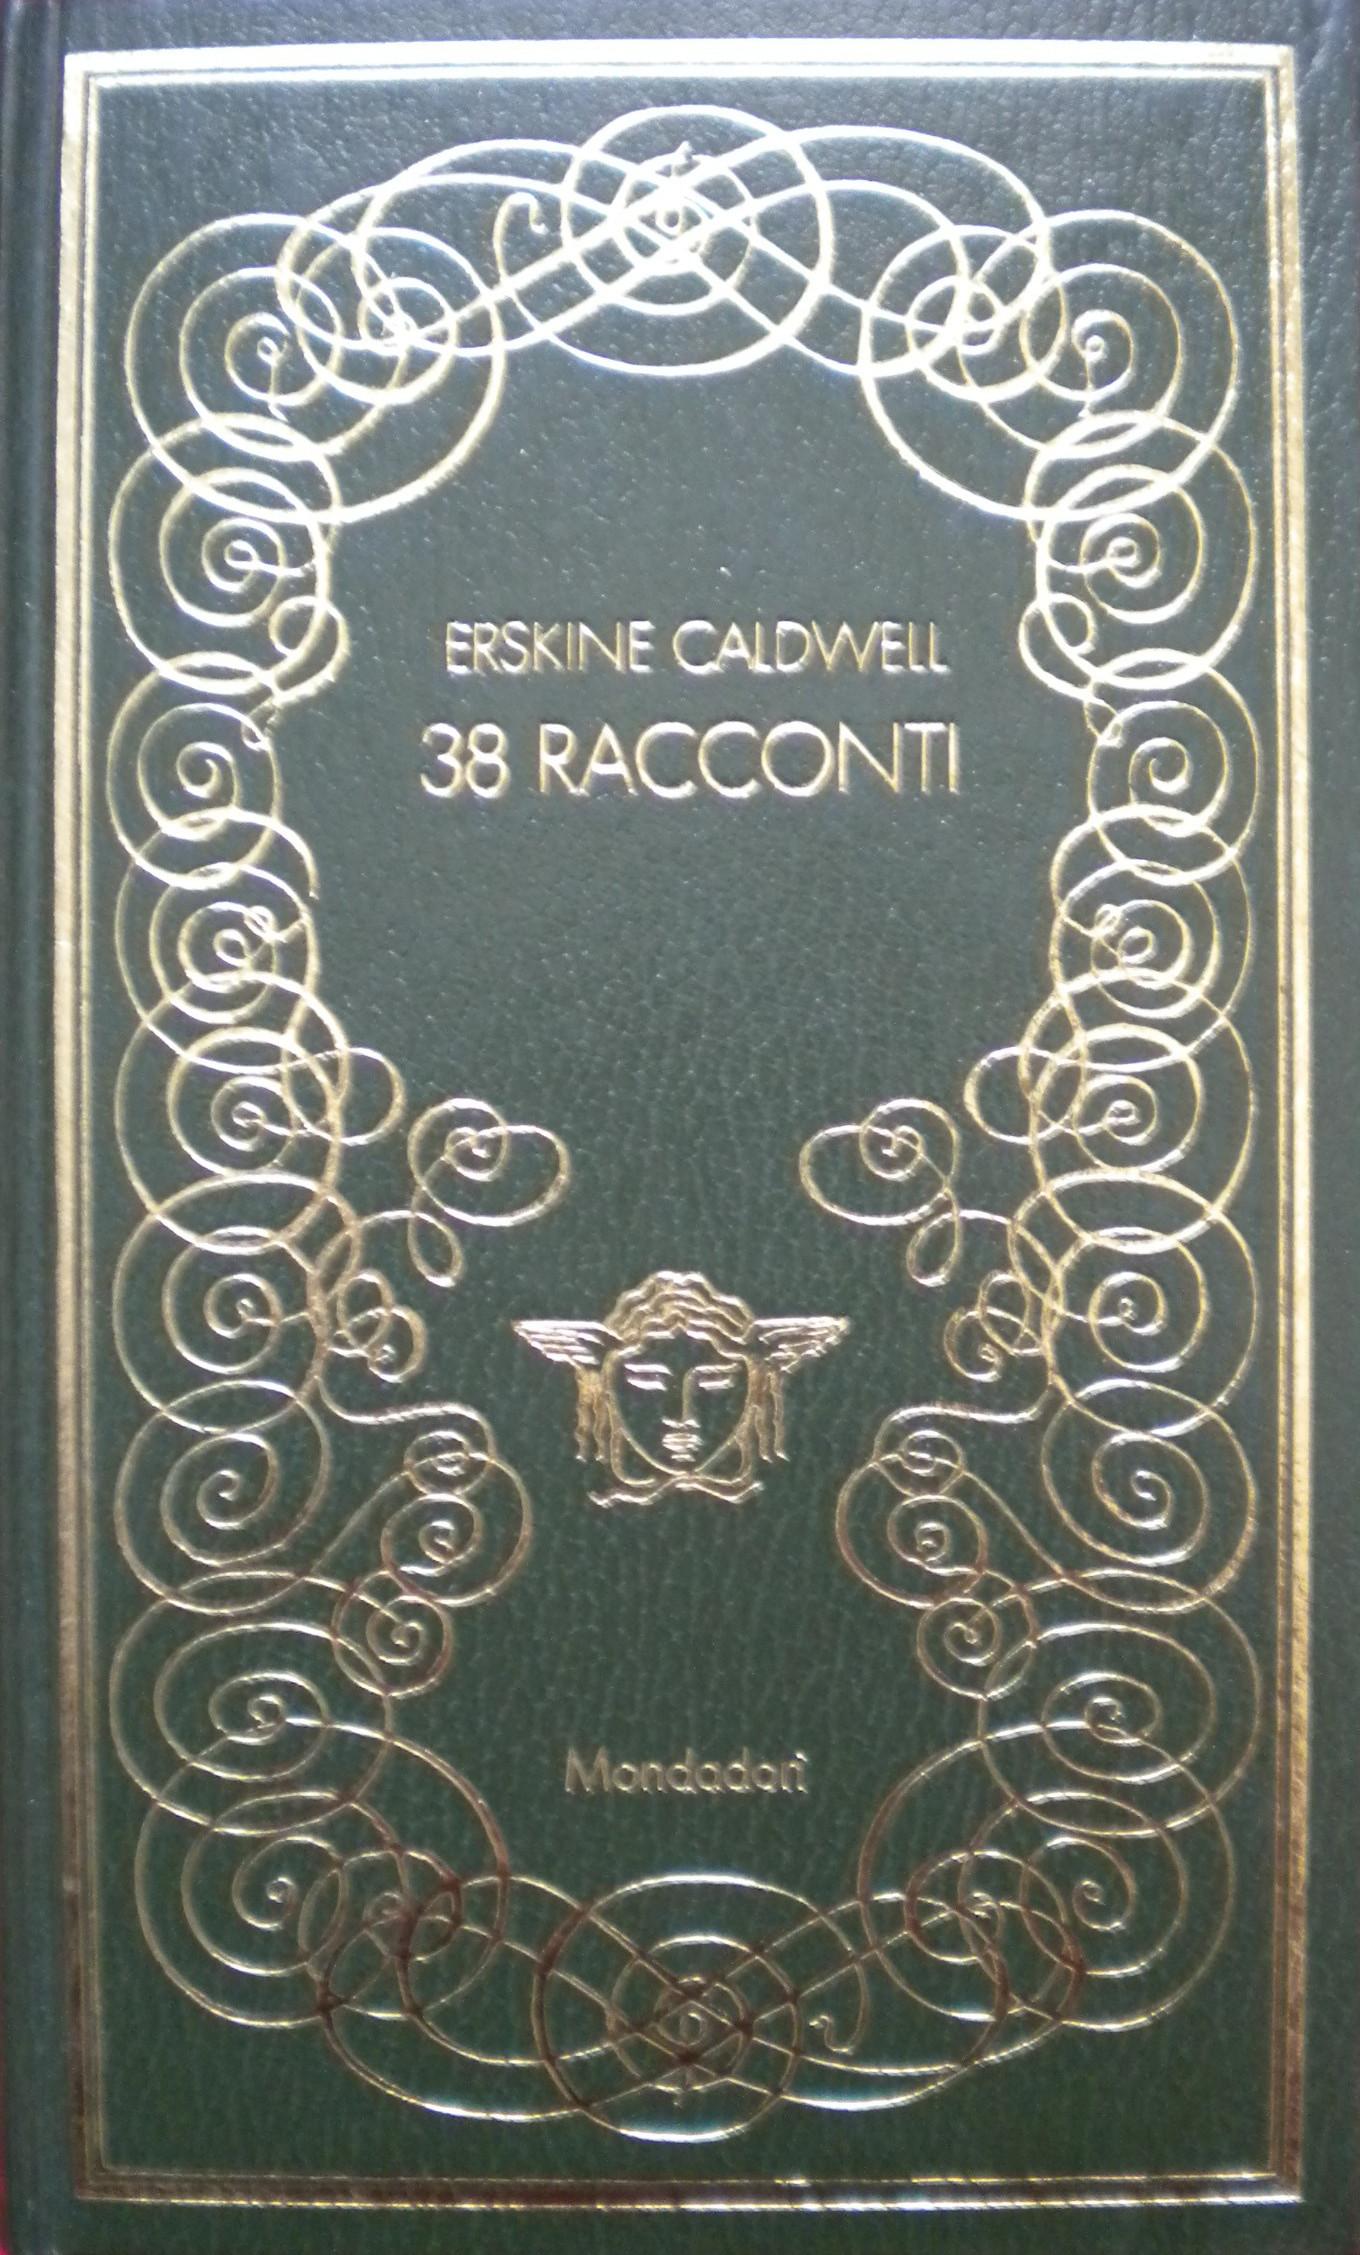 Erskine Caldwell, 38 racconti, Mondadori